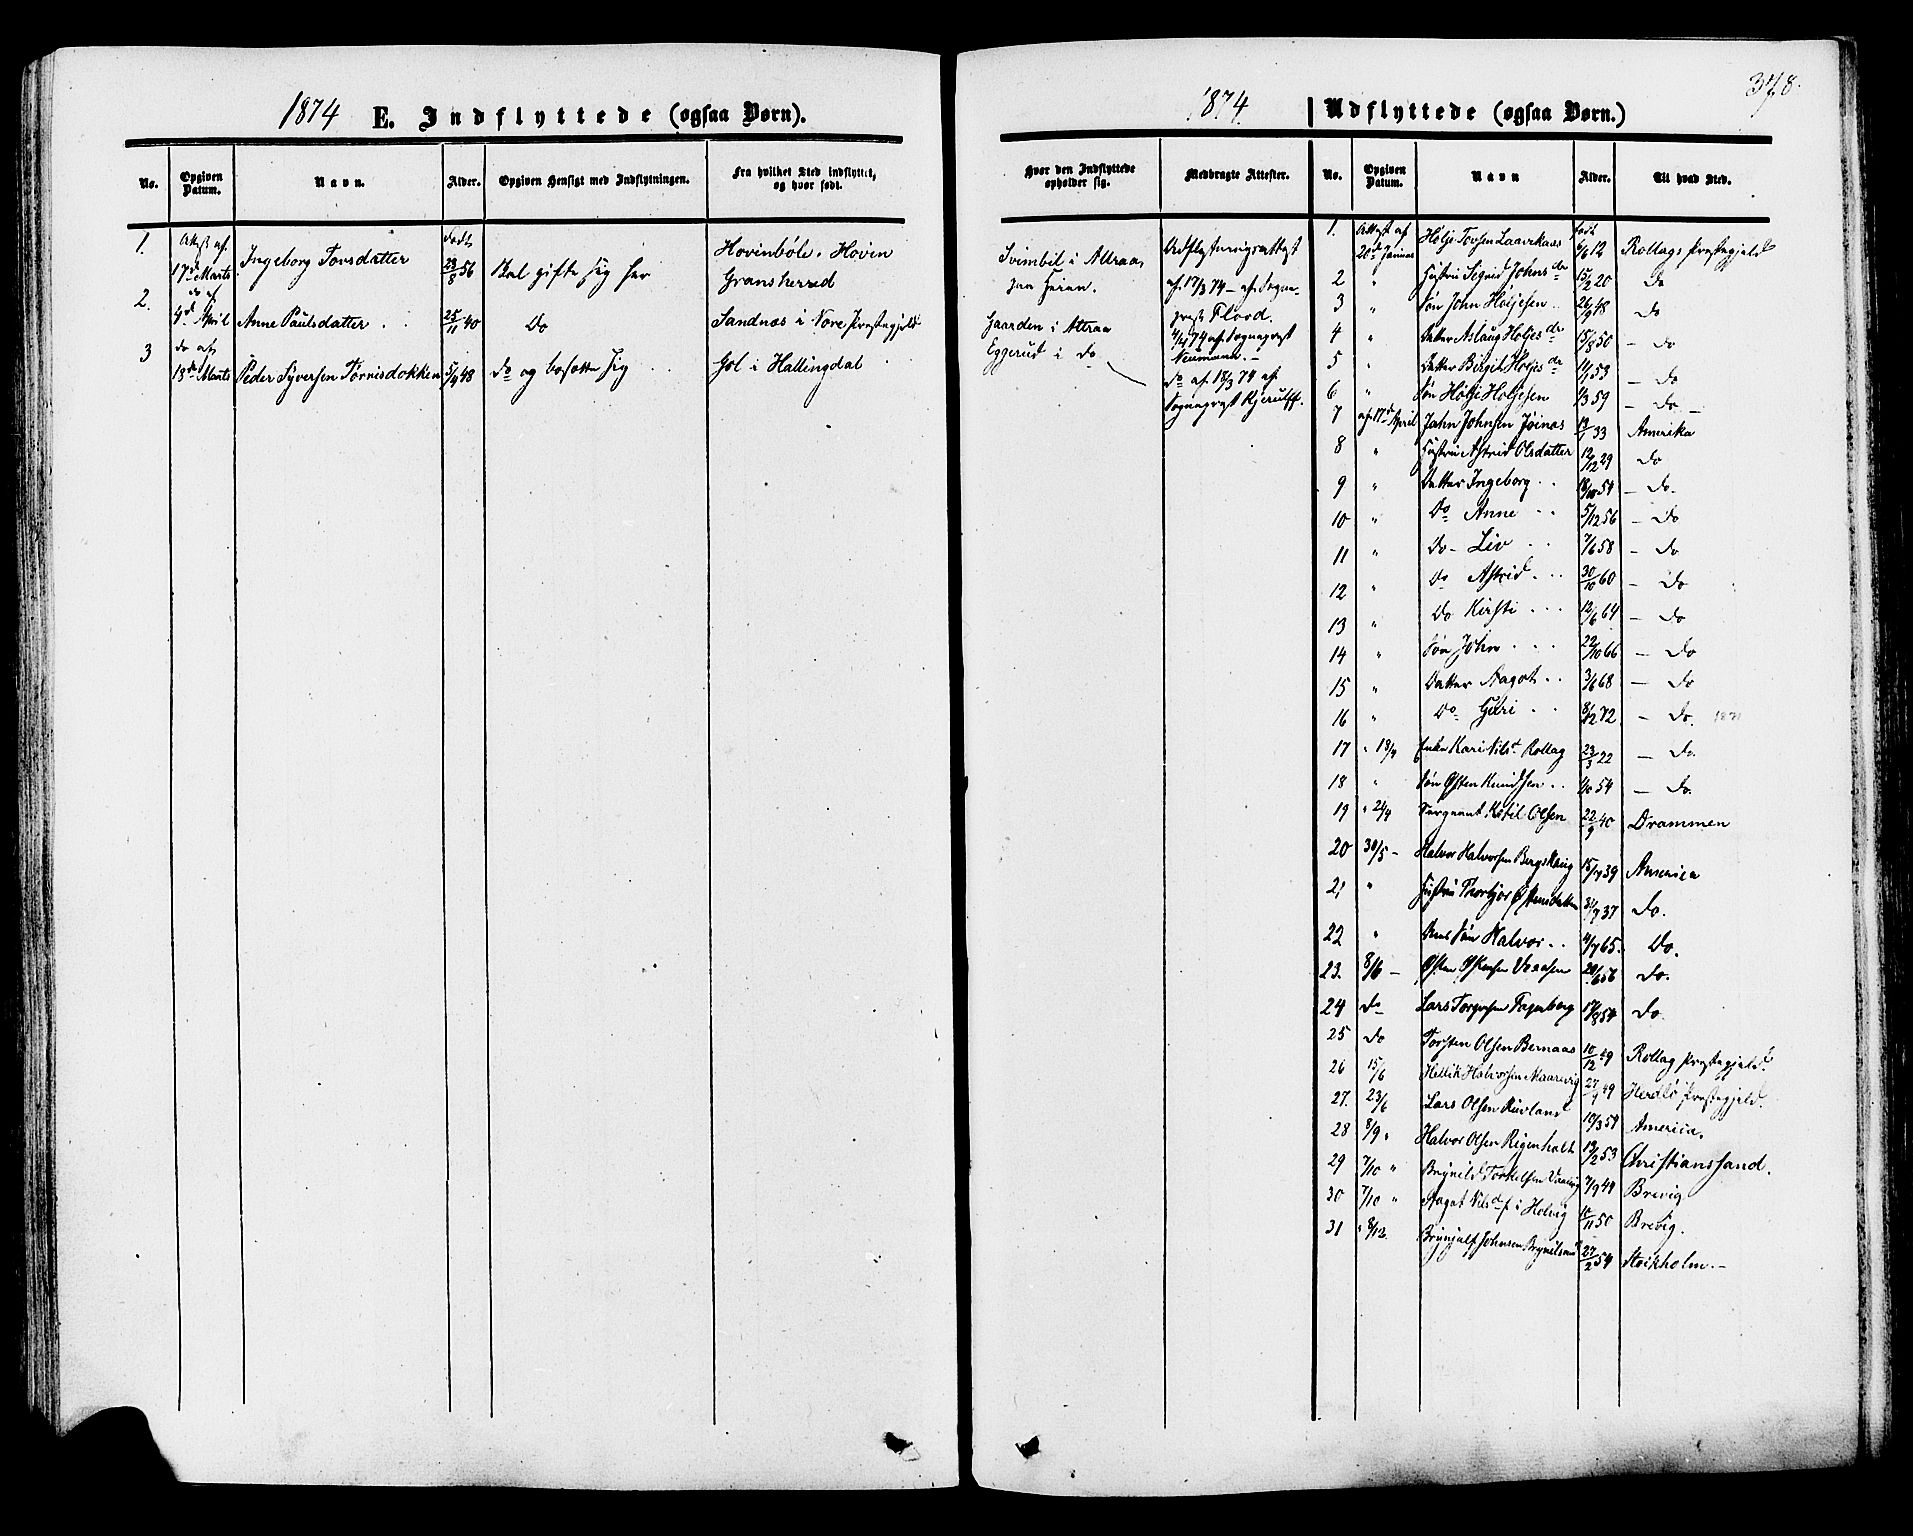 SAKO, Tinn kirkebøker, F/Fa/L0006: Ministerialbok nr. I 6, 1857-1878, s. 378